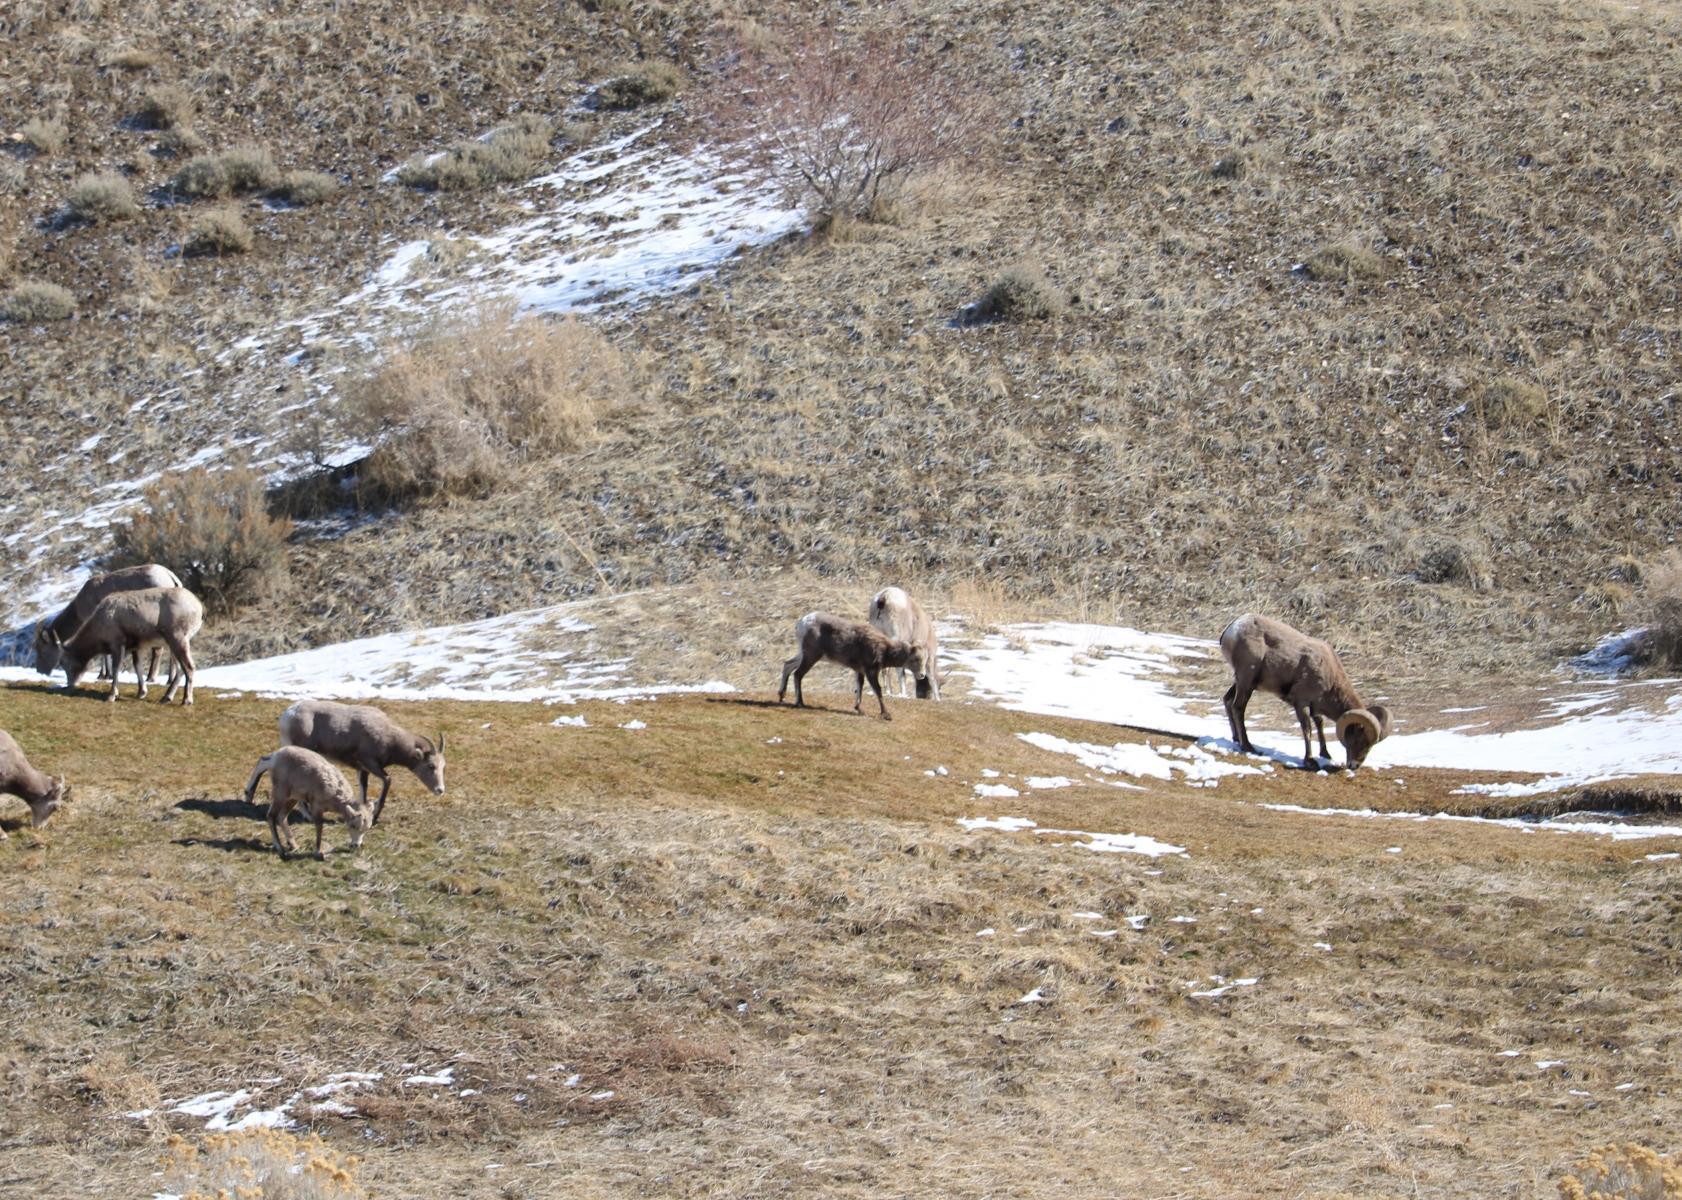 Click image for larger version  Name:Cedar Hills Sheep 3.jpg Views:53 Size:478.3 KB ID:146361